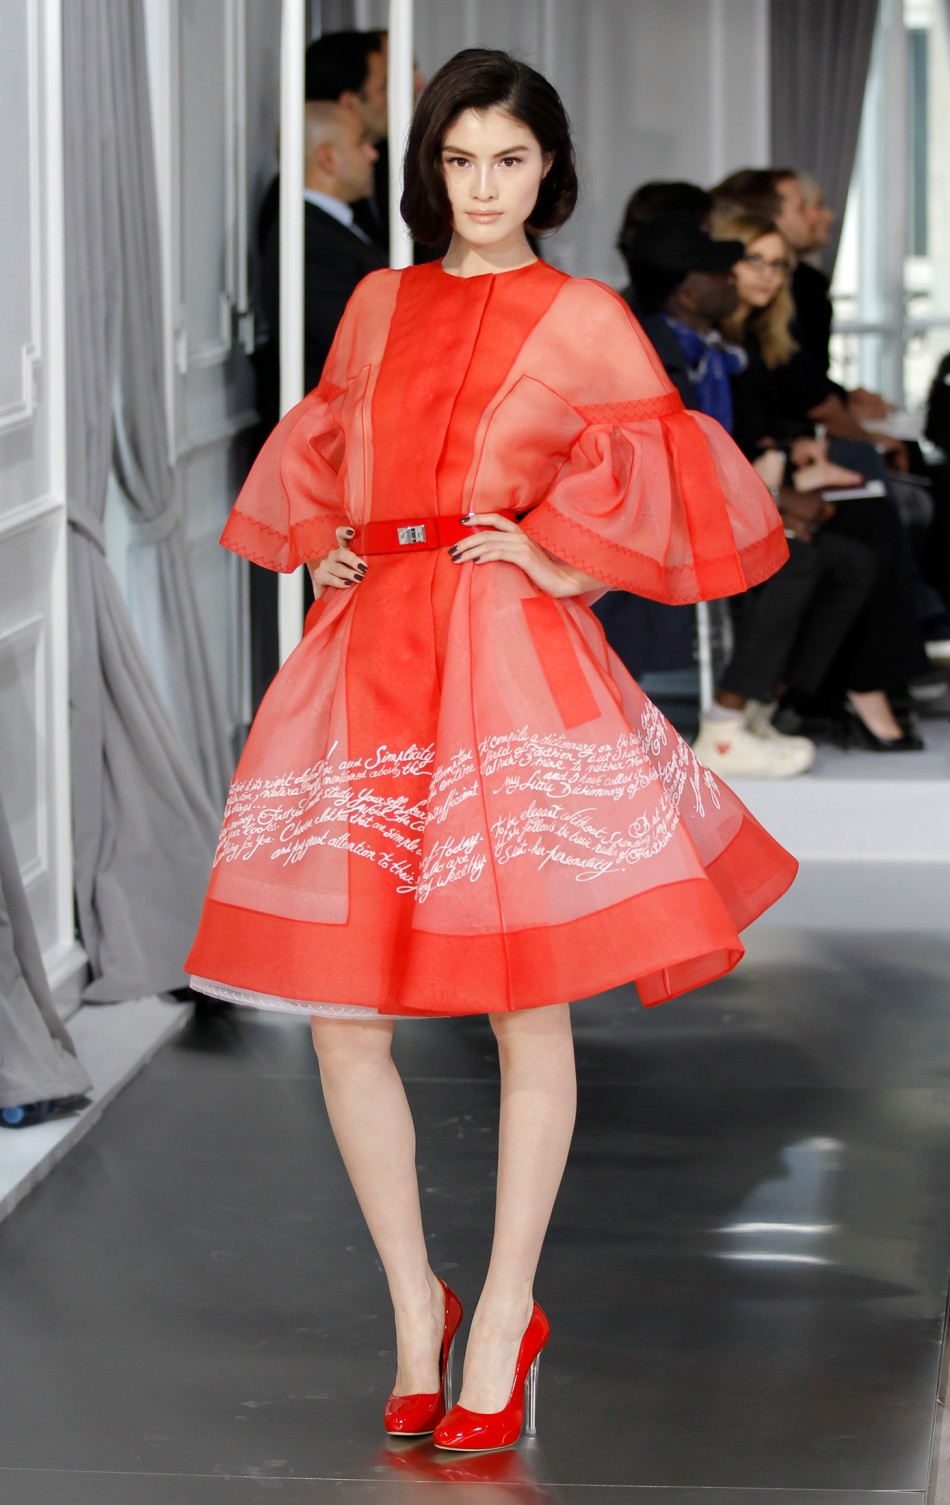 Paris Fashion Week: 10 Best Looks of Spring-Summer 2012